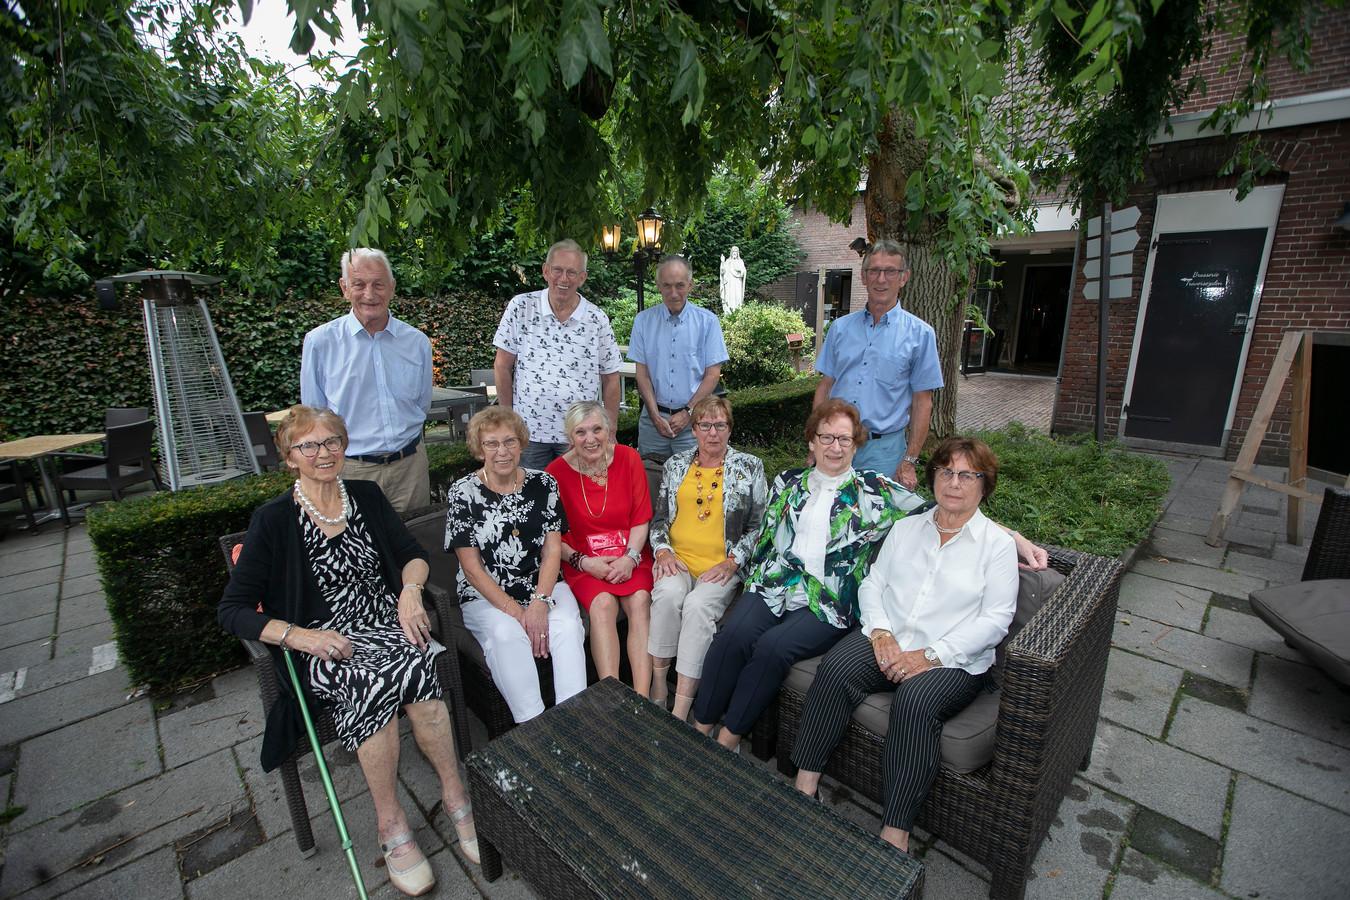 Op de bank (vlnr): Mariet (83), Rieki (79), Gerda (76), Corrie (82), Betsy (85) en Nelly (81). Staand (vlnr): Jos (74), Ad (72), Piet (78) en Henk (71)